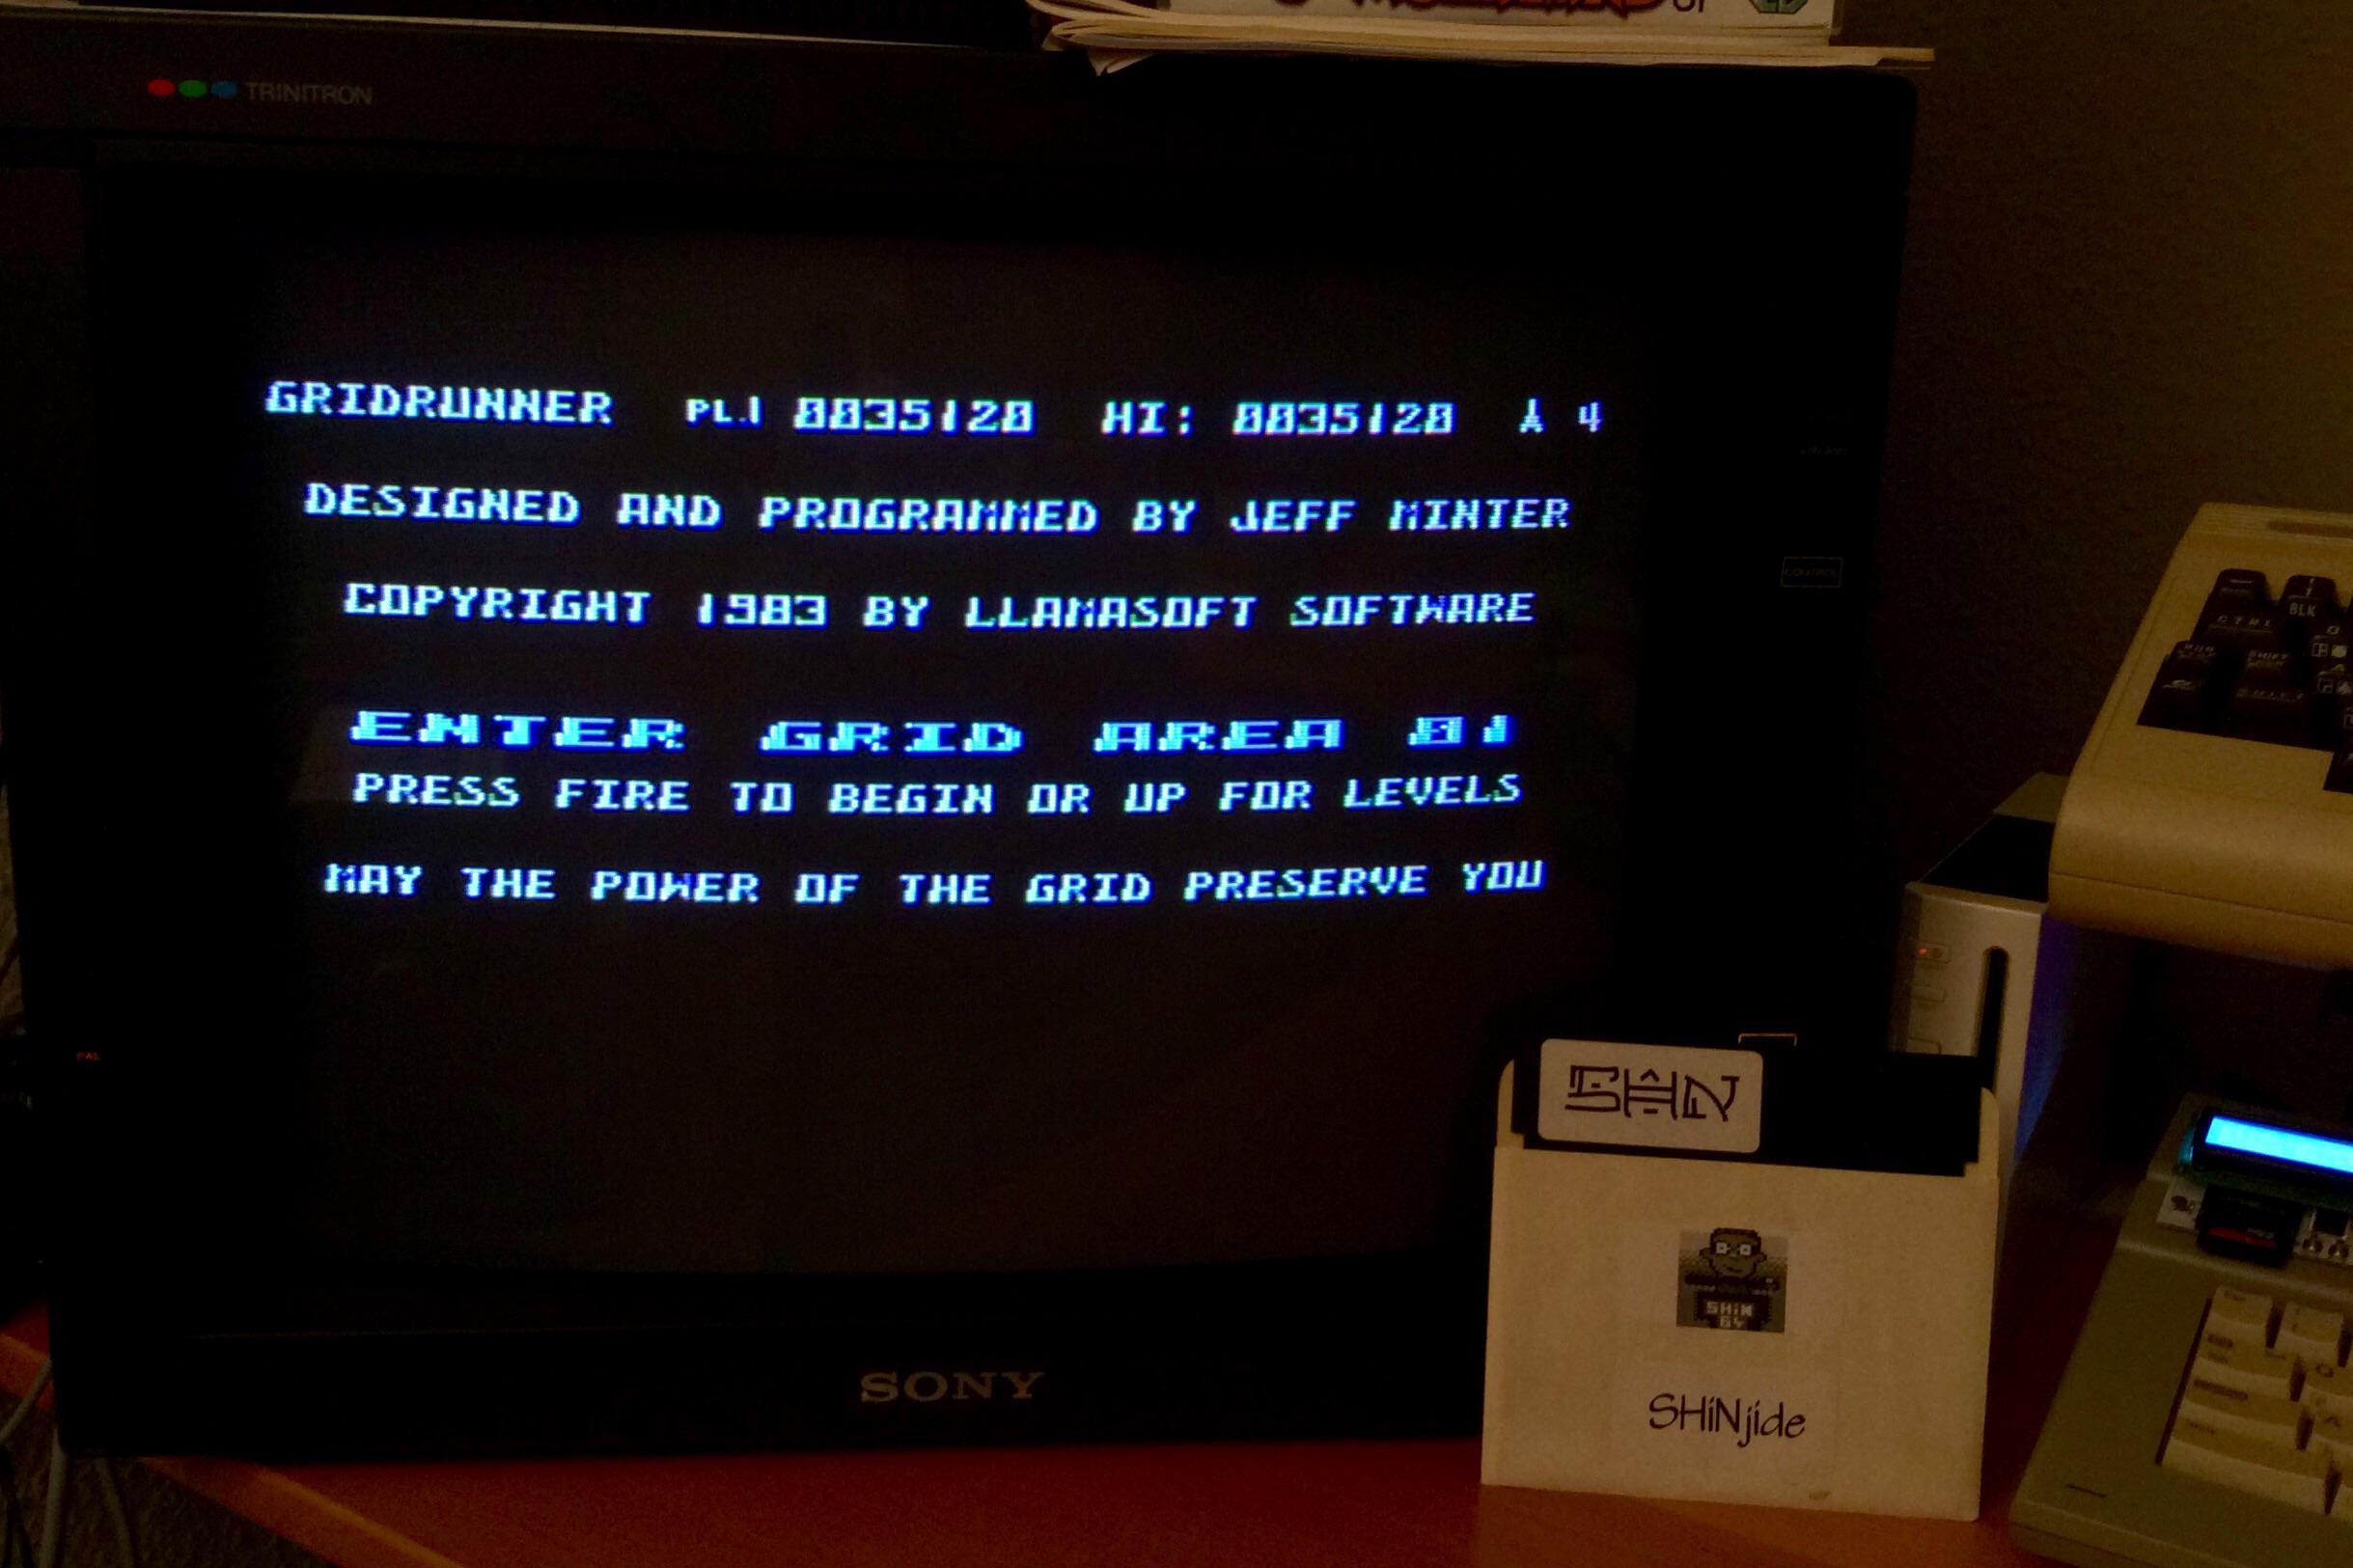 SHiNjide: Gridrunner (Atari 400/800/XL/XE) 35,120 points on 2015-02-04 15:44:23